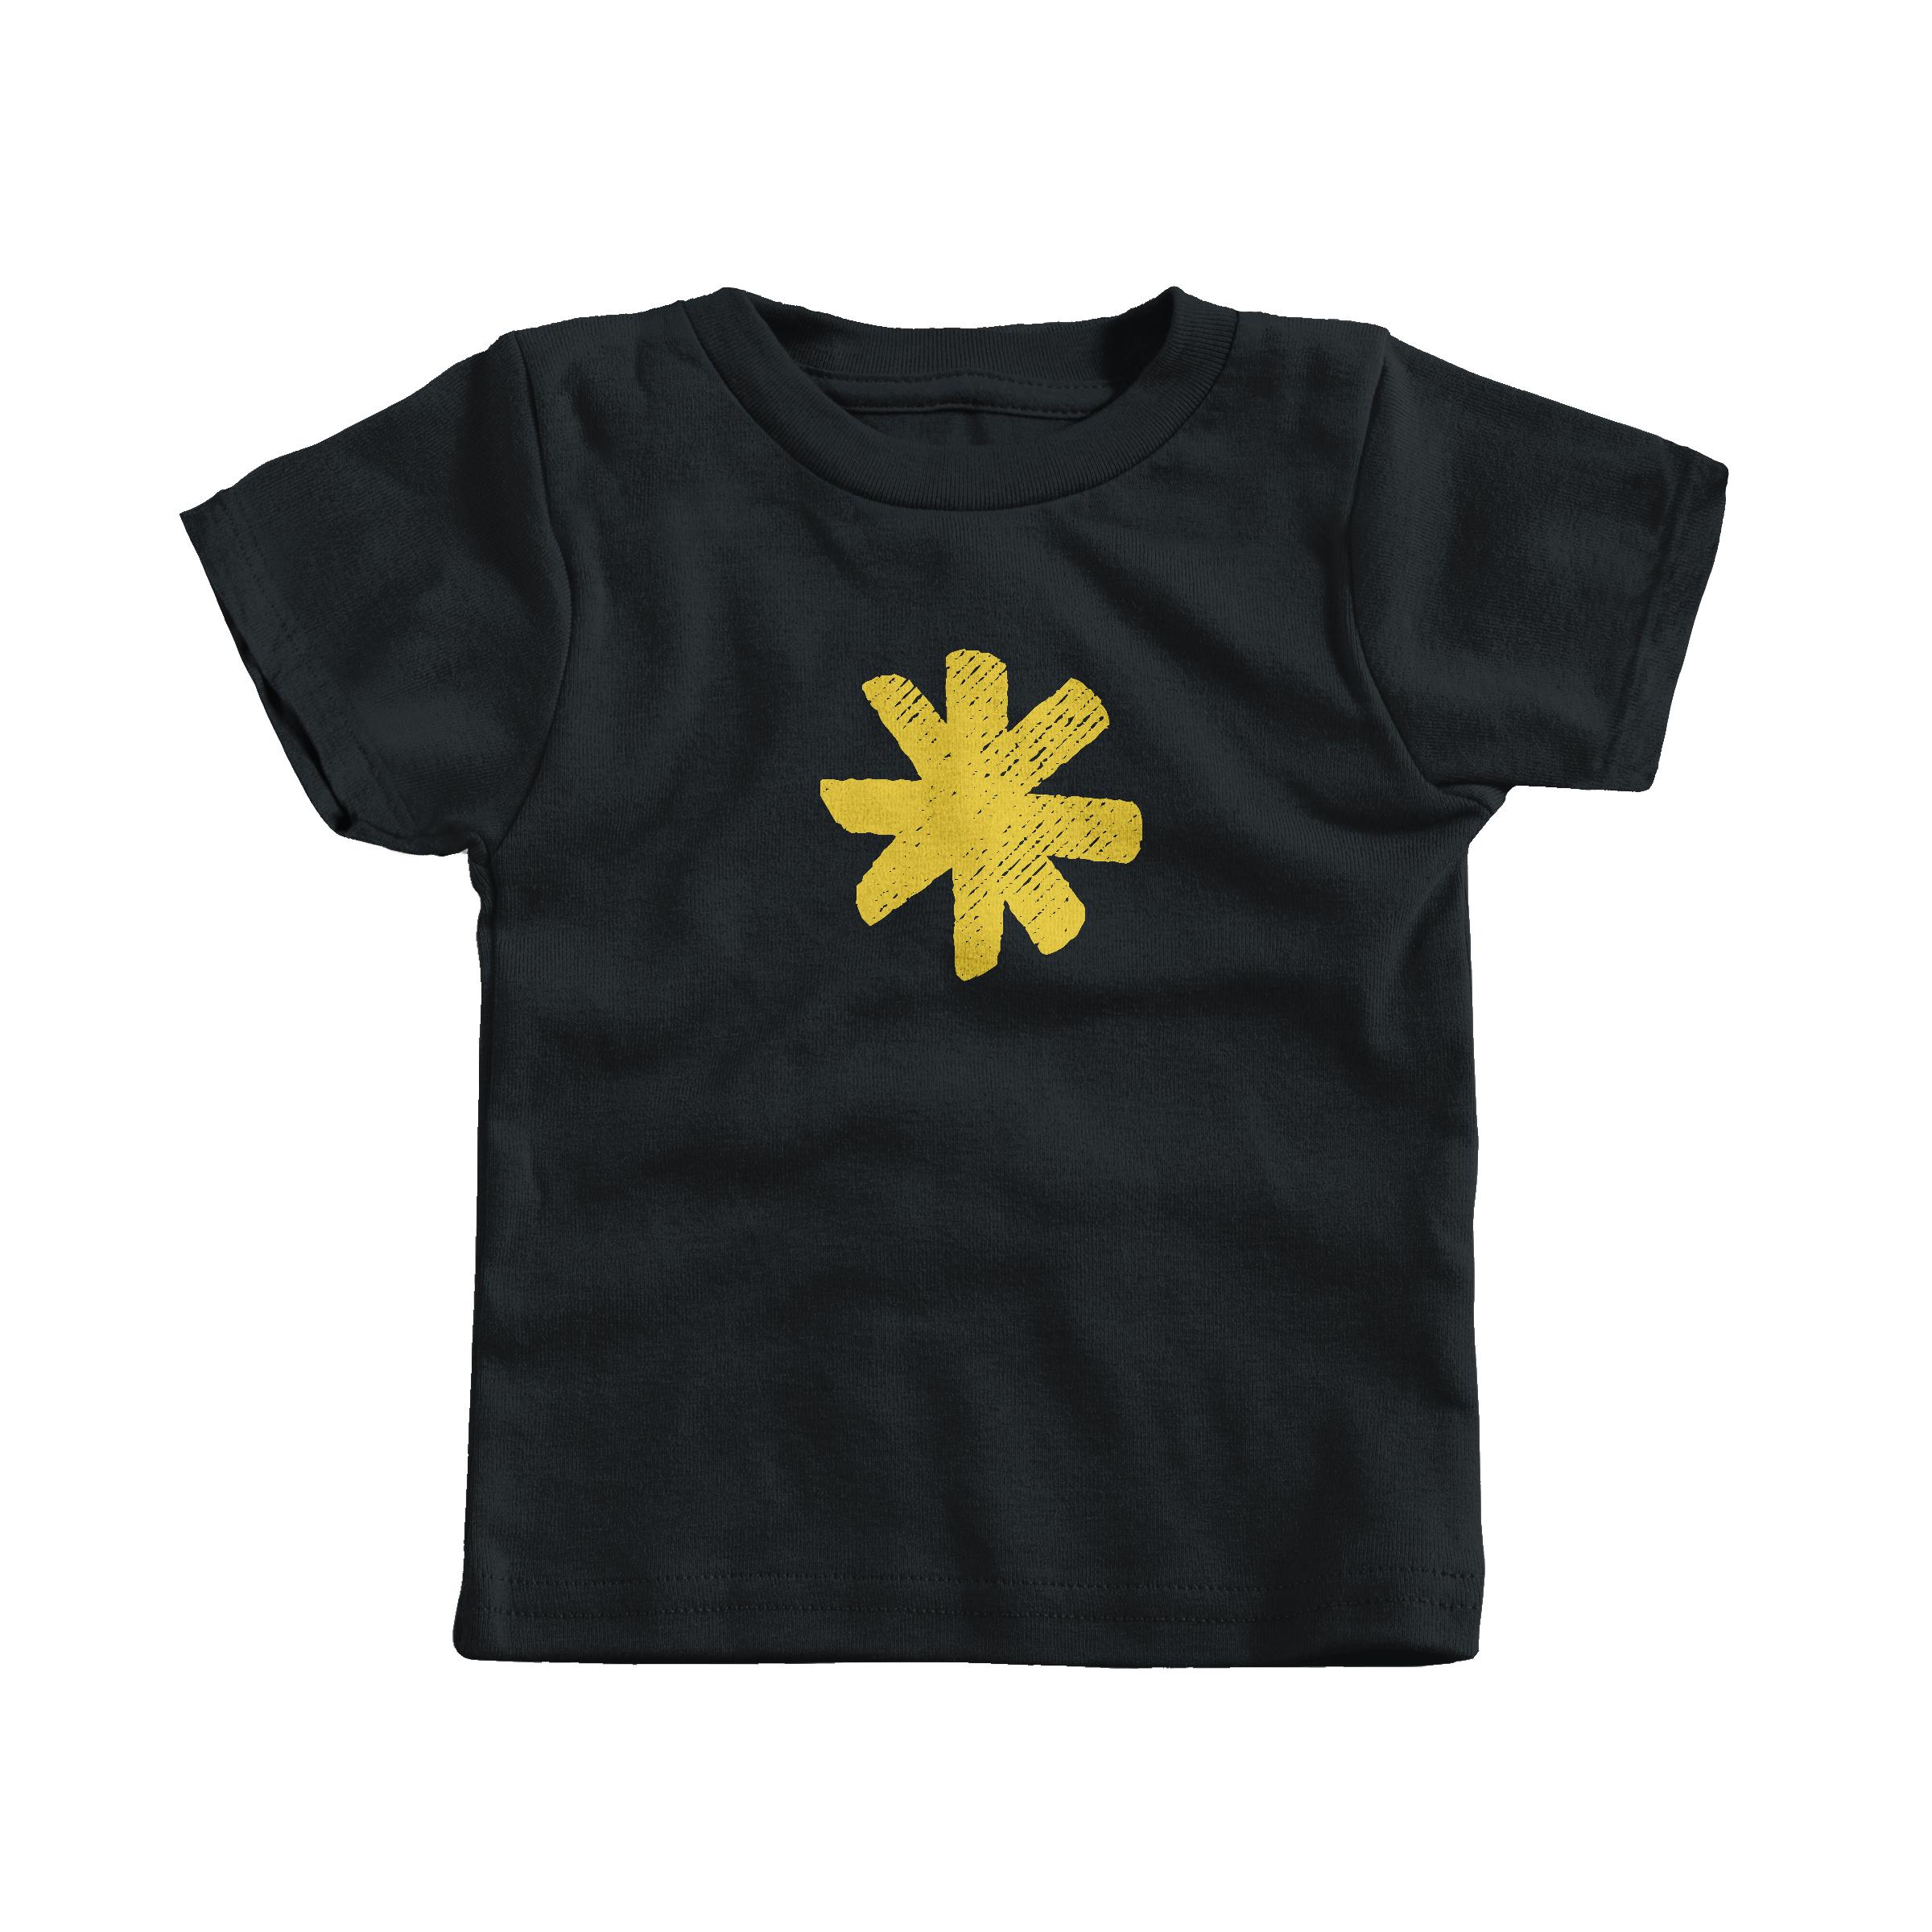 MOXIE Black (T-Shirt)